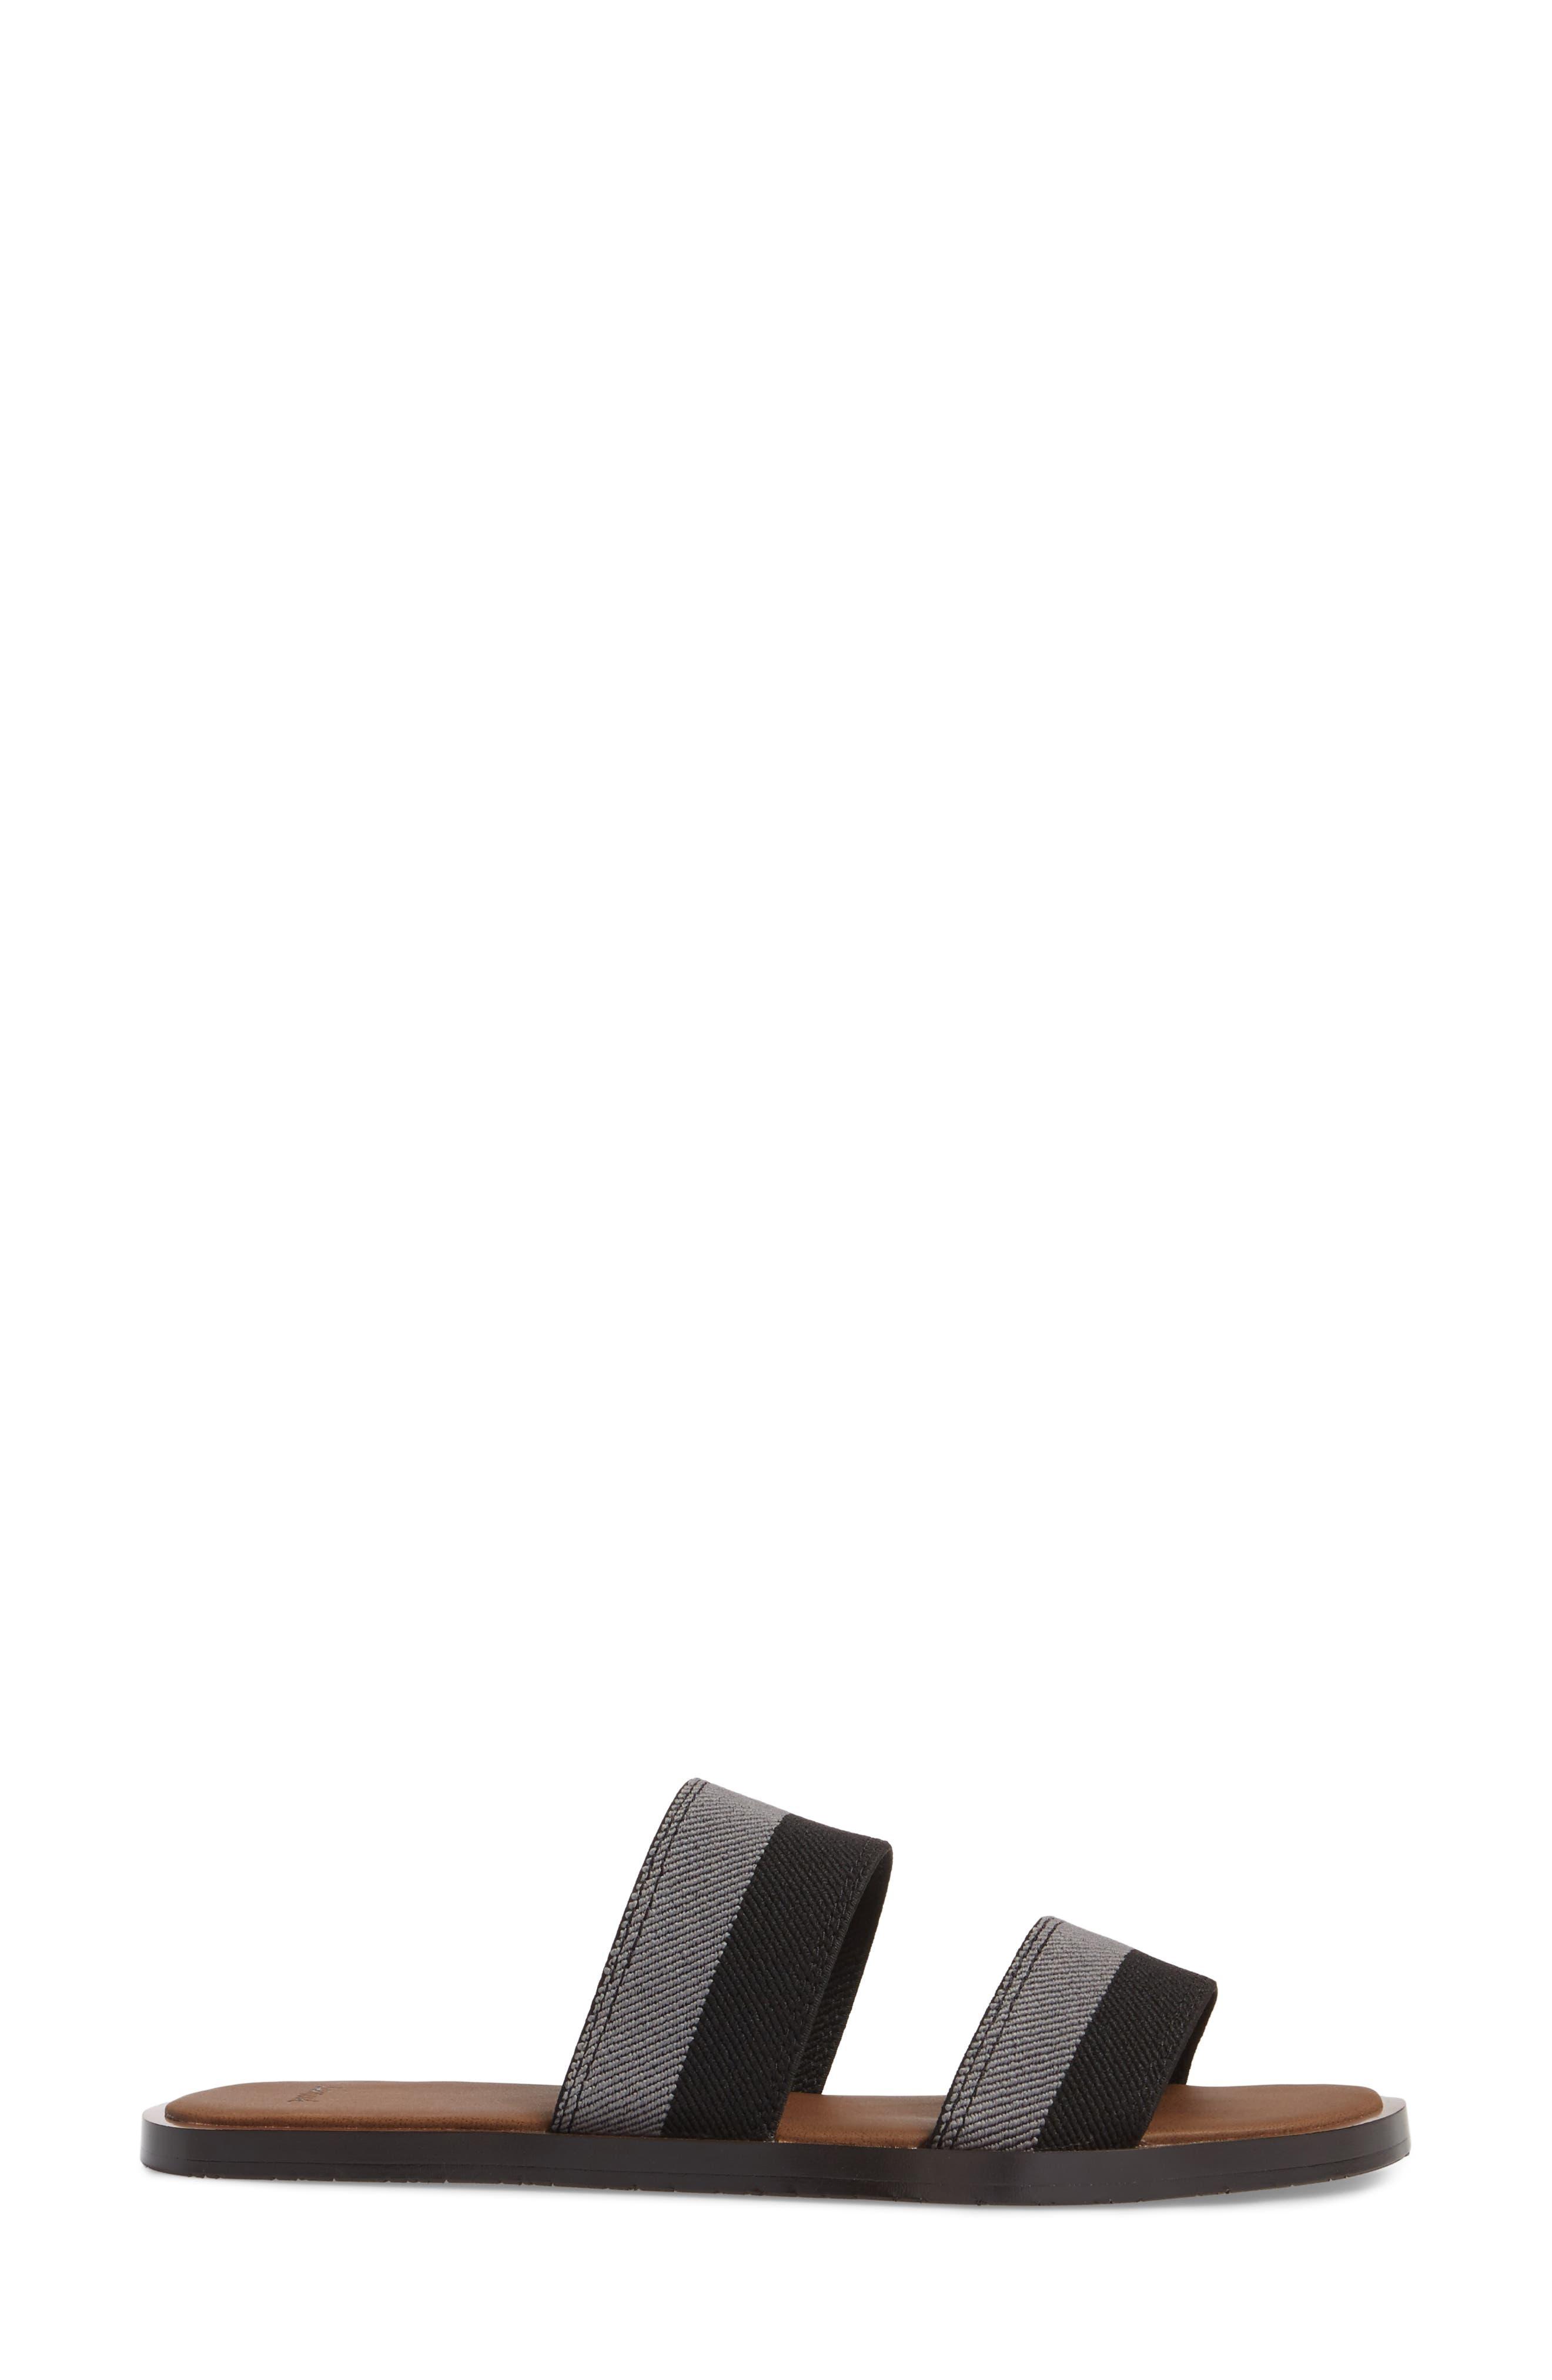 Yoga Gora Gora Slide Sandal,                             Alternate thumbnail 3, color,                             BLACK/ CHARCOAL